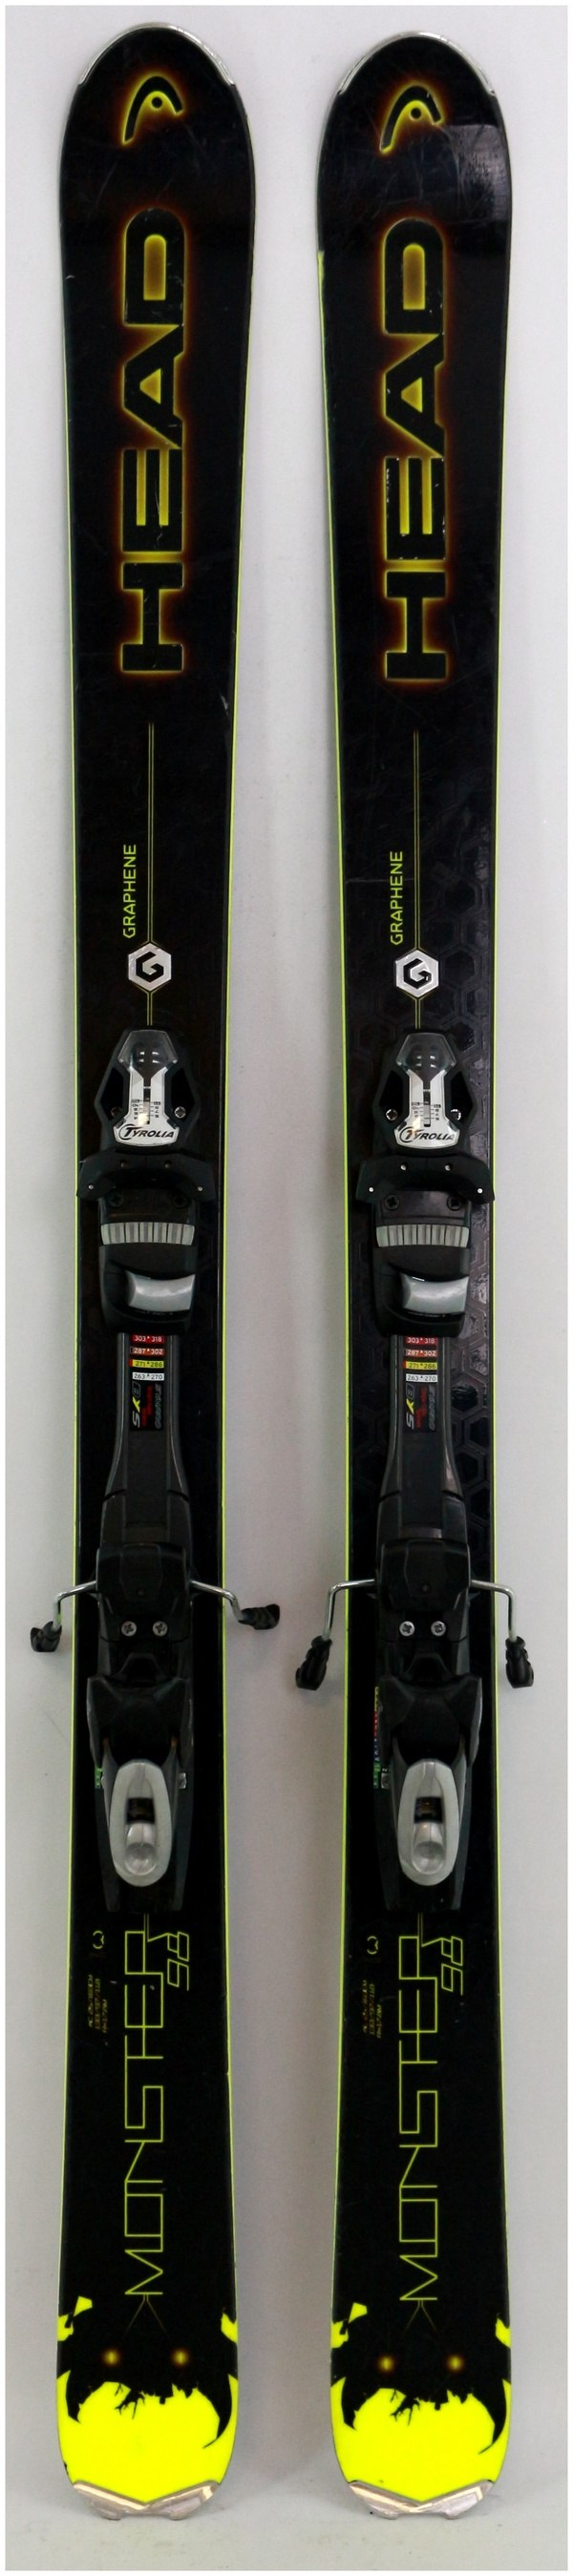 Tyrolia SP12 SYMPRO downhill ski bindings